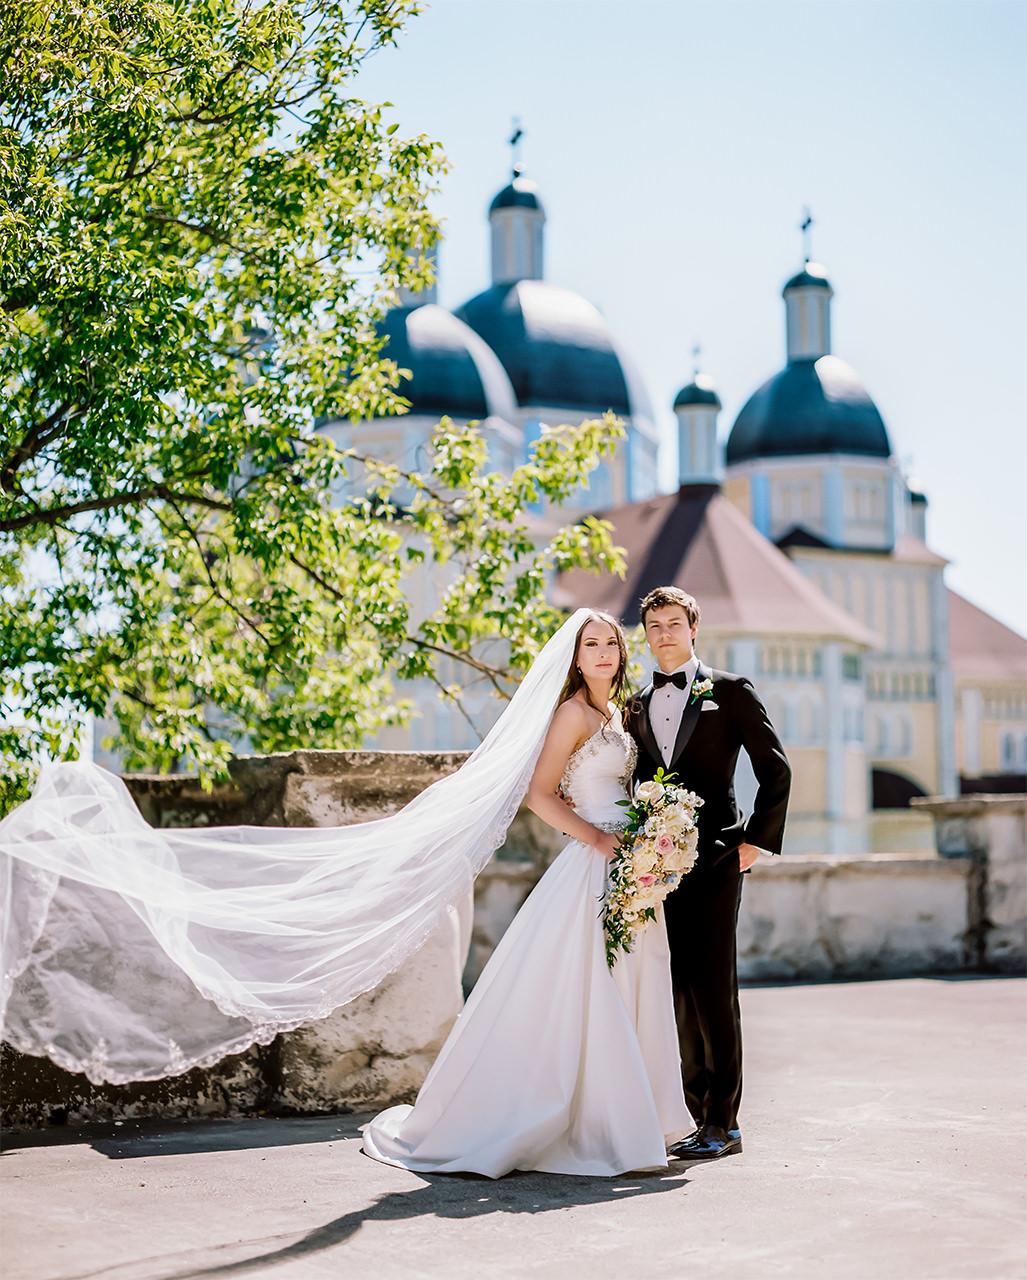 Kirstin+Edward|Married-Wedding-Grotto-CooksCreek-Manitoba-EvergreenVillage-ClassyWedding-HighEndWedding-LuxuryWedding-FineArtWedding-Winnipeg-WinnipegWeddingPhotographer-019.jpg